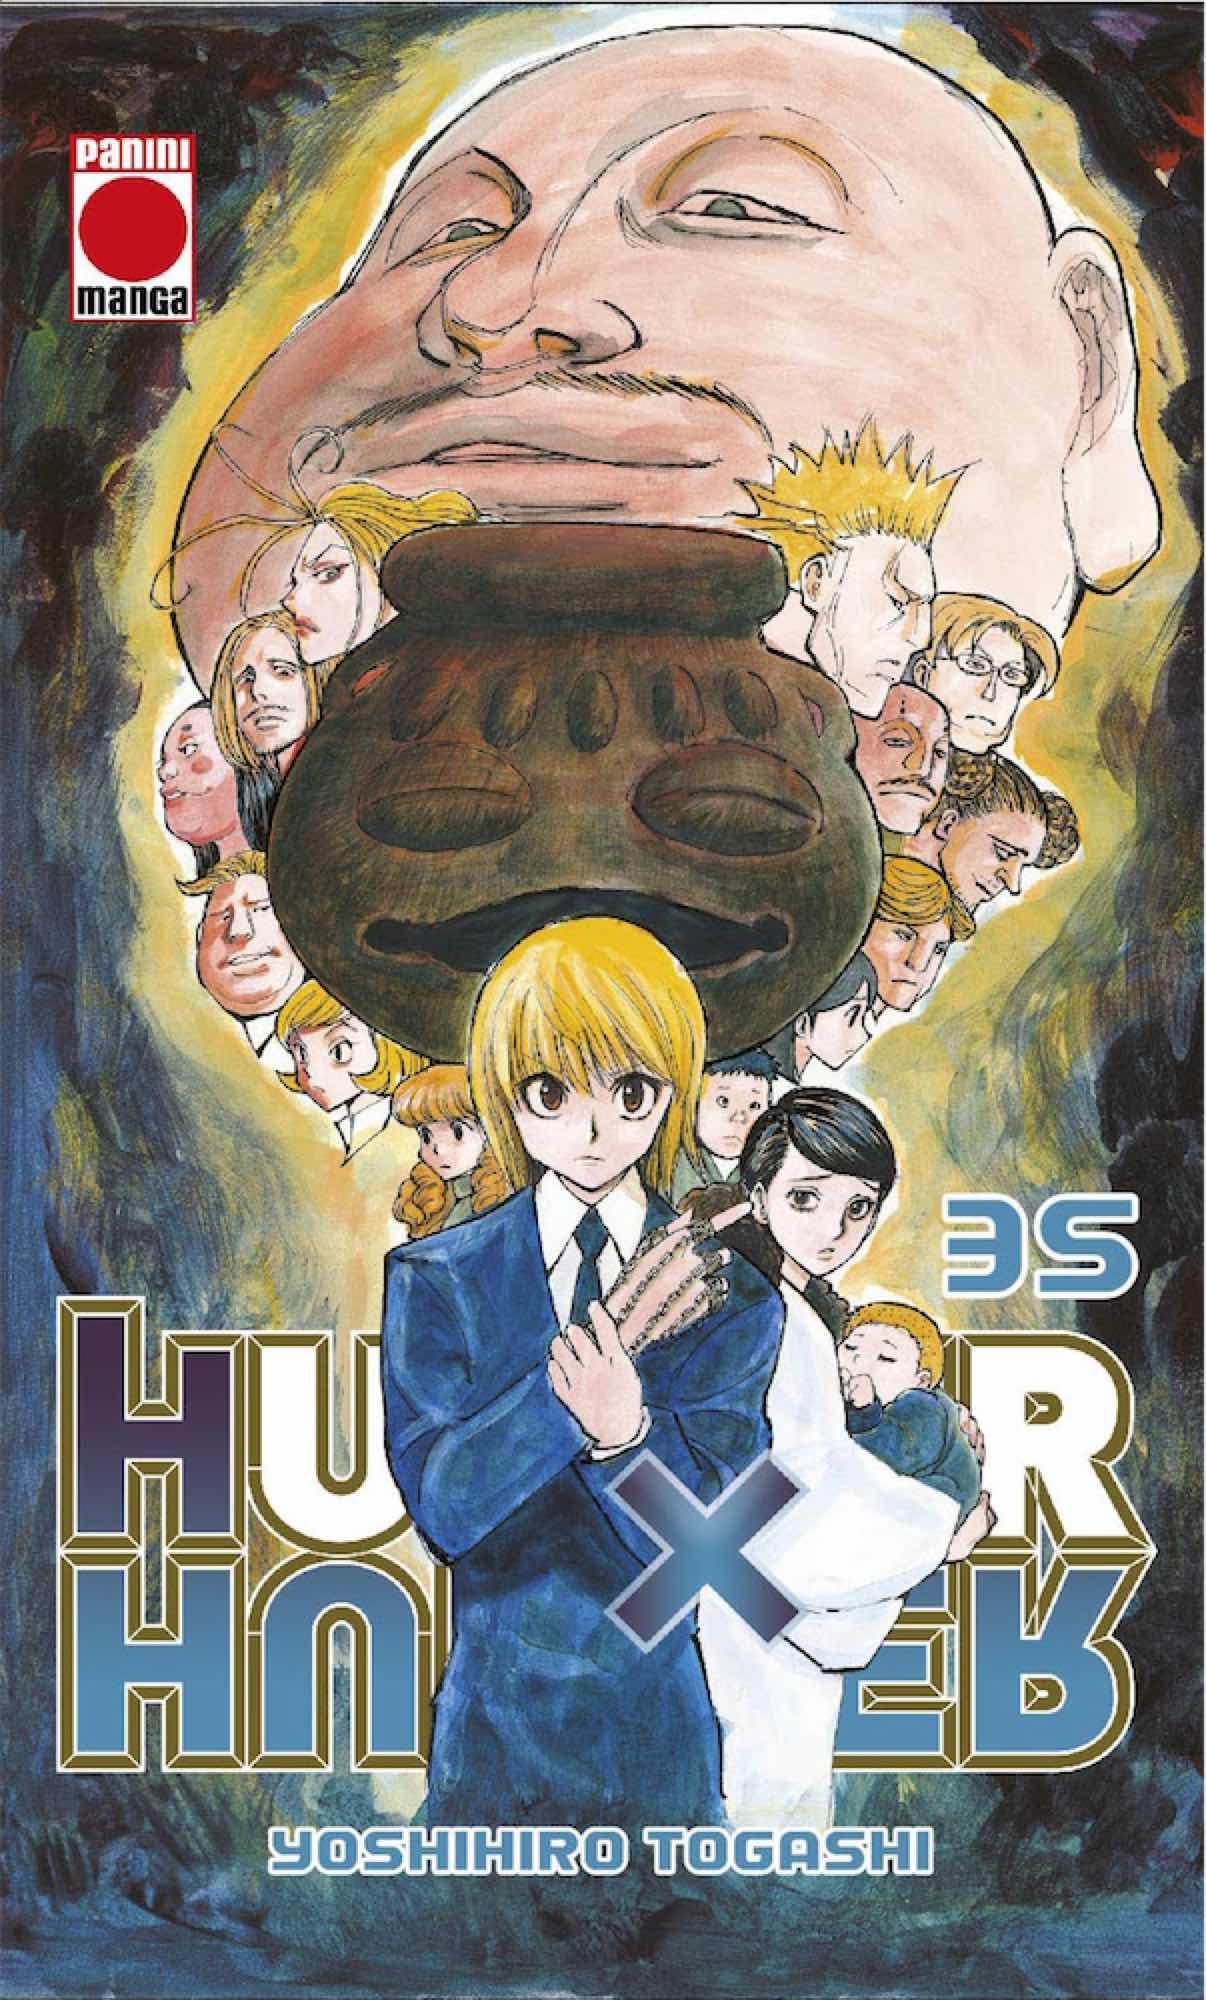 HUNTER X HUNTER 35